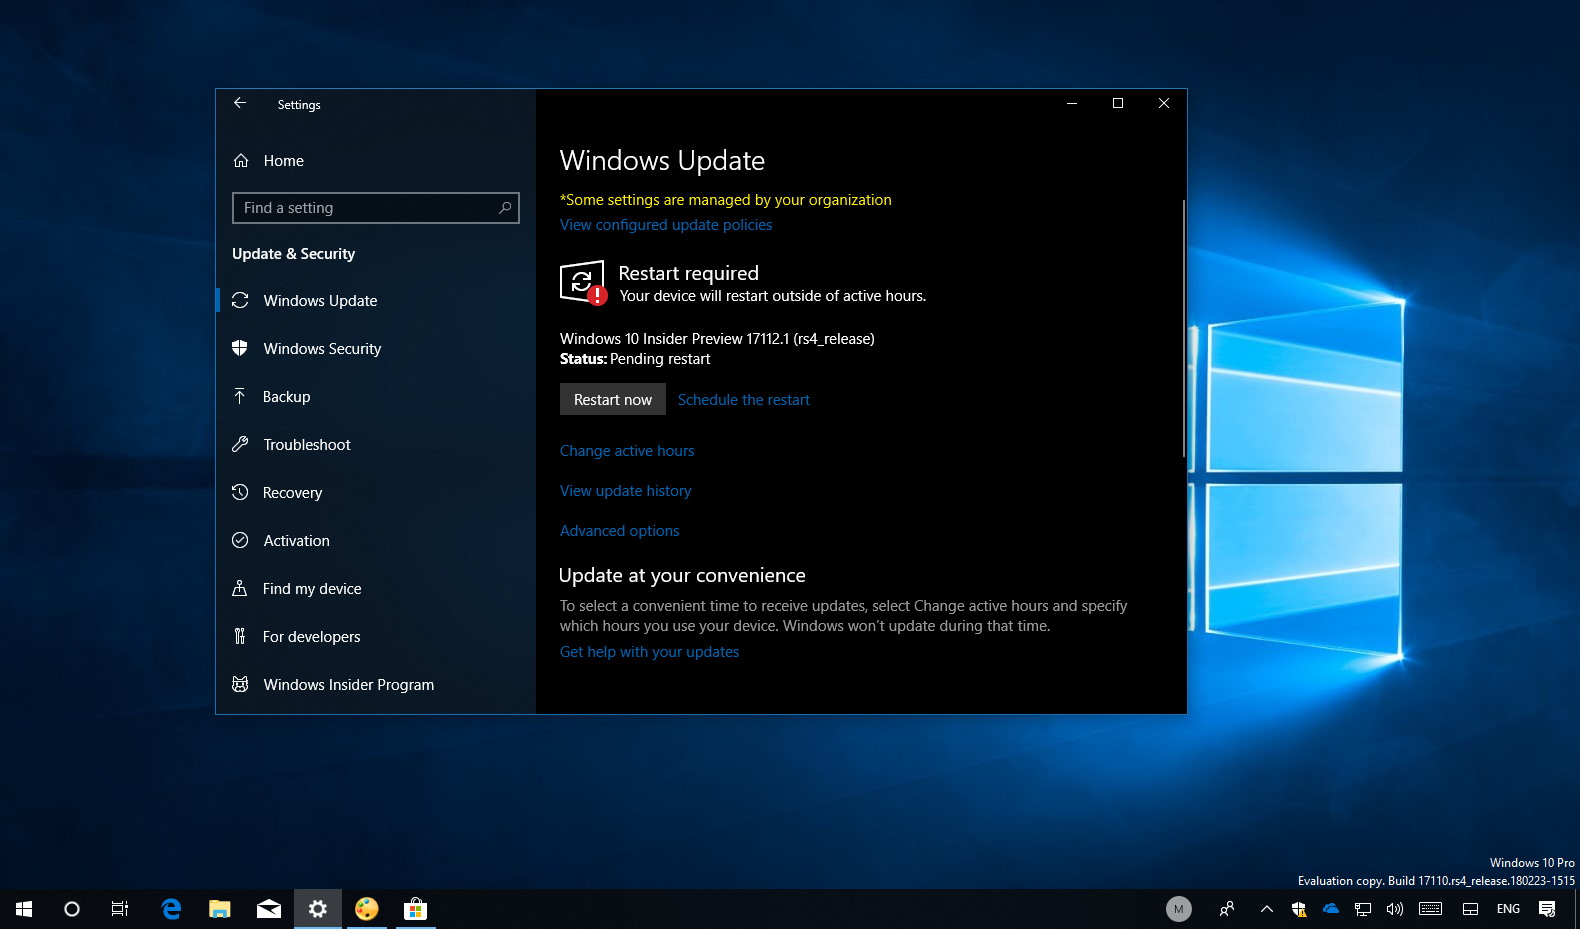 Windows 10 build 17112